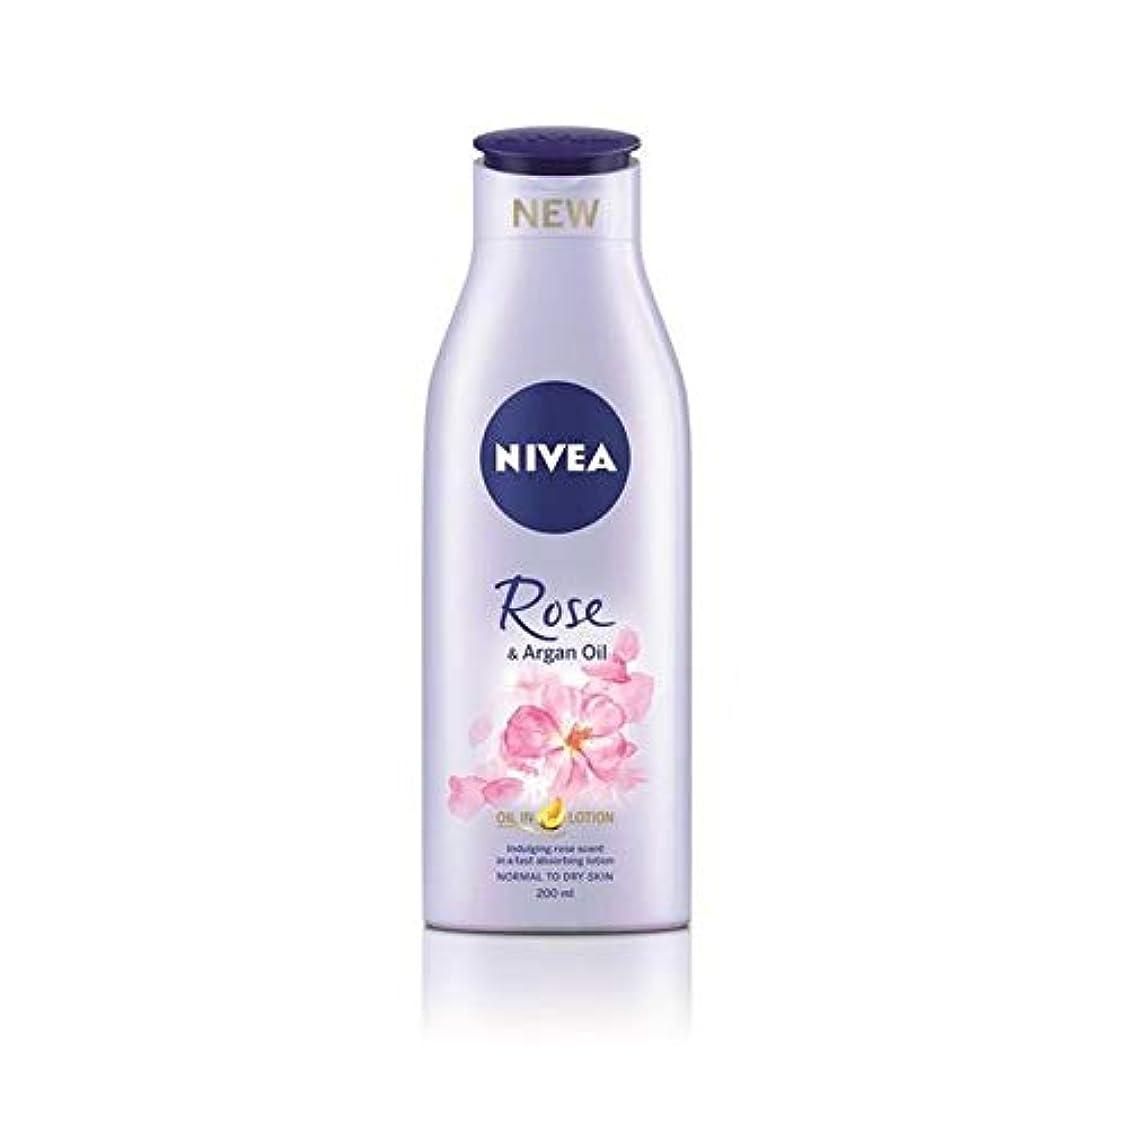 [Nivea ] ニベアは、ローズ&アルガンオイルボディローション200Ml - Nivea Rose & Argan Oil Body Lotion 200ml [並行輸入品]